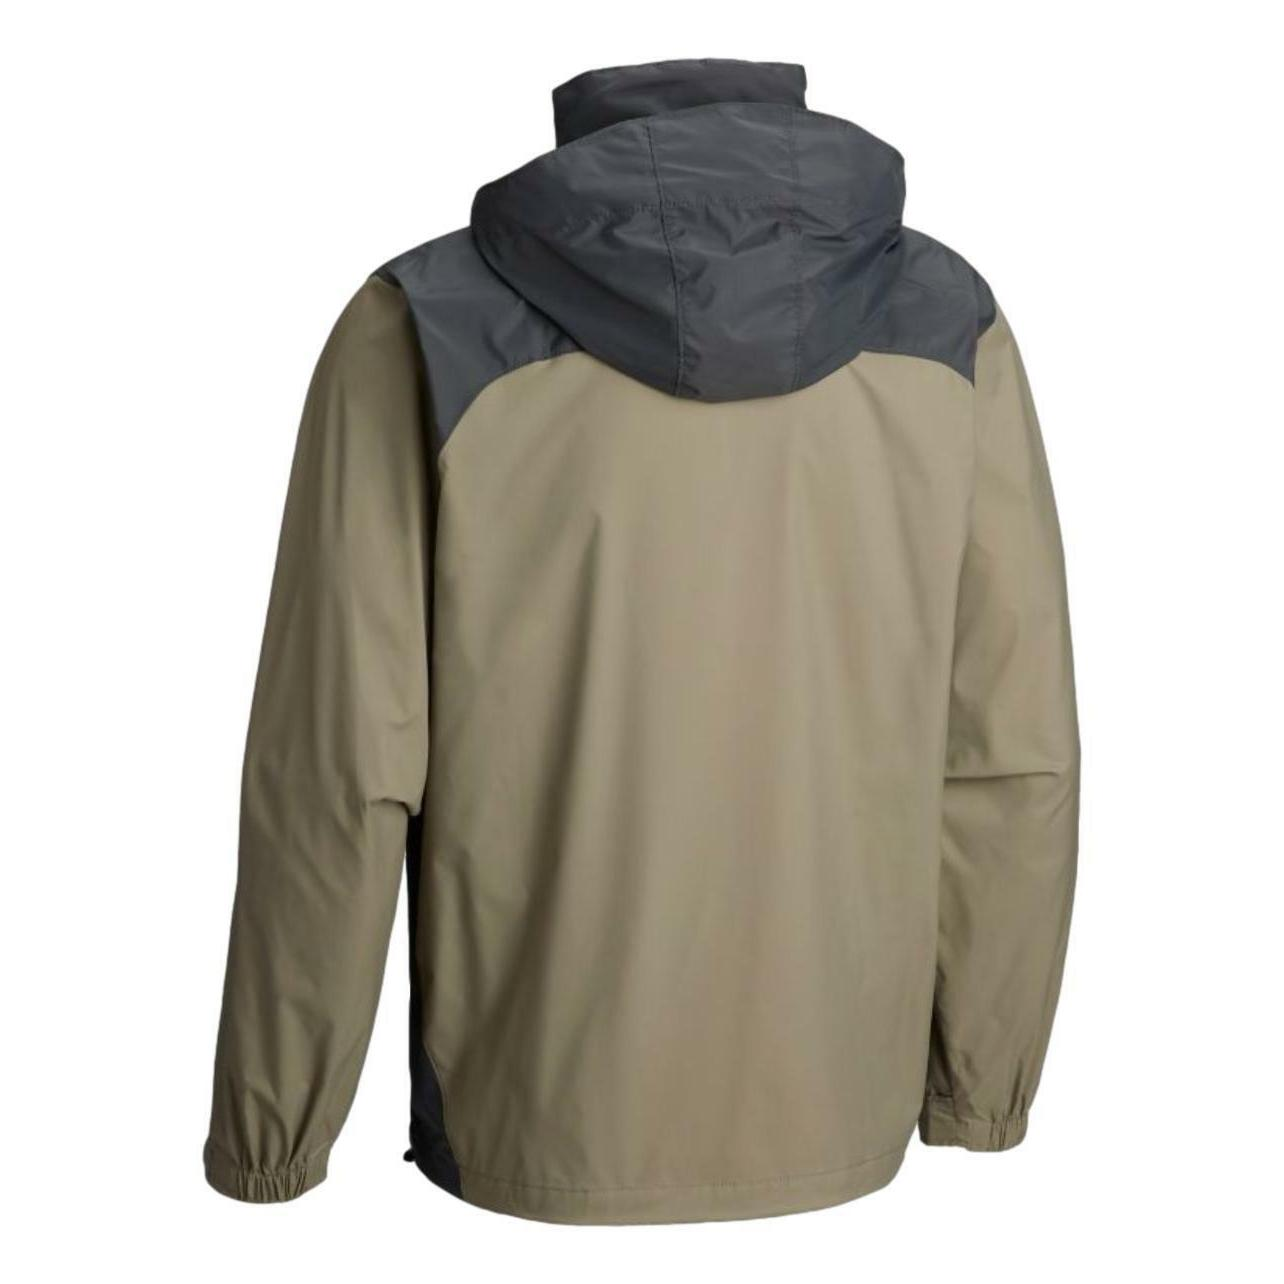 New Columbia mens Raincreek repellent rain coat Tan Gray